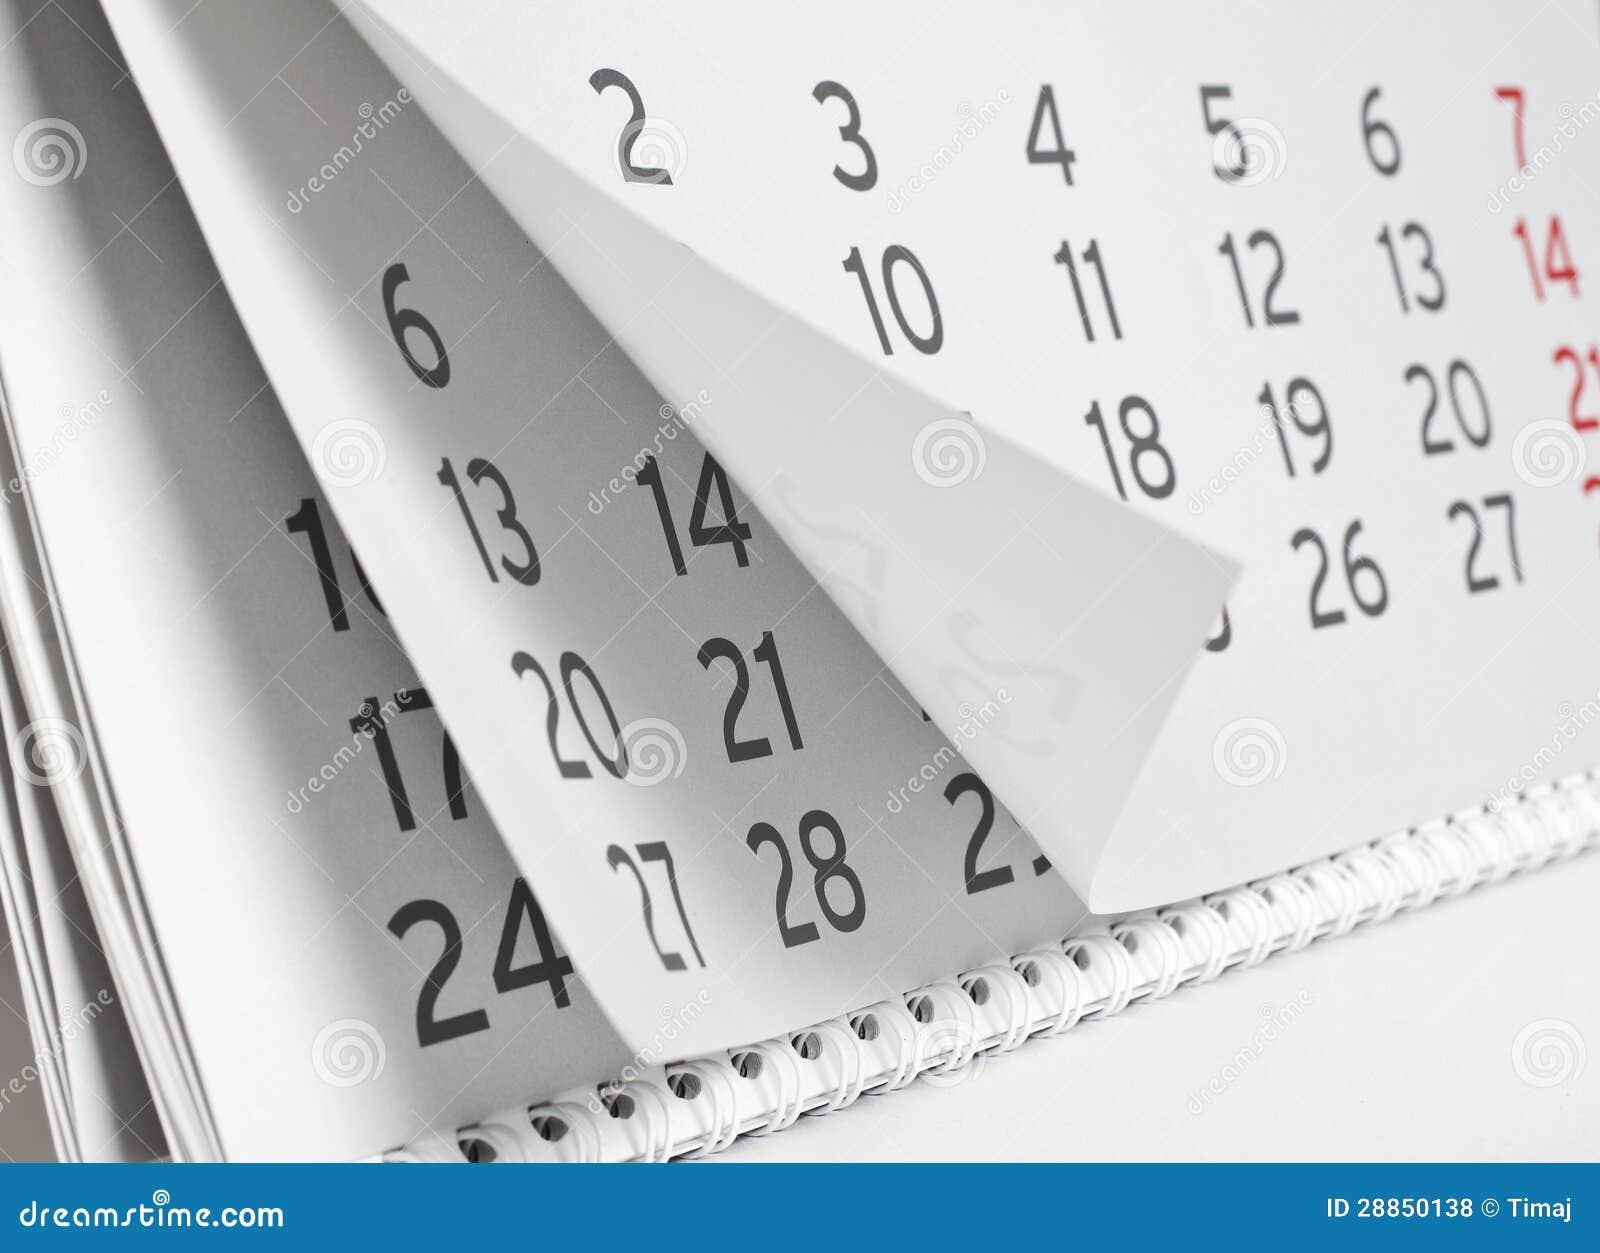 Calendar Stock Photo Image Of Office Agenda Memo Paper 28850138